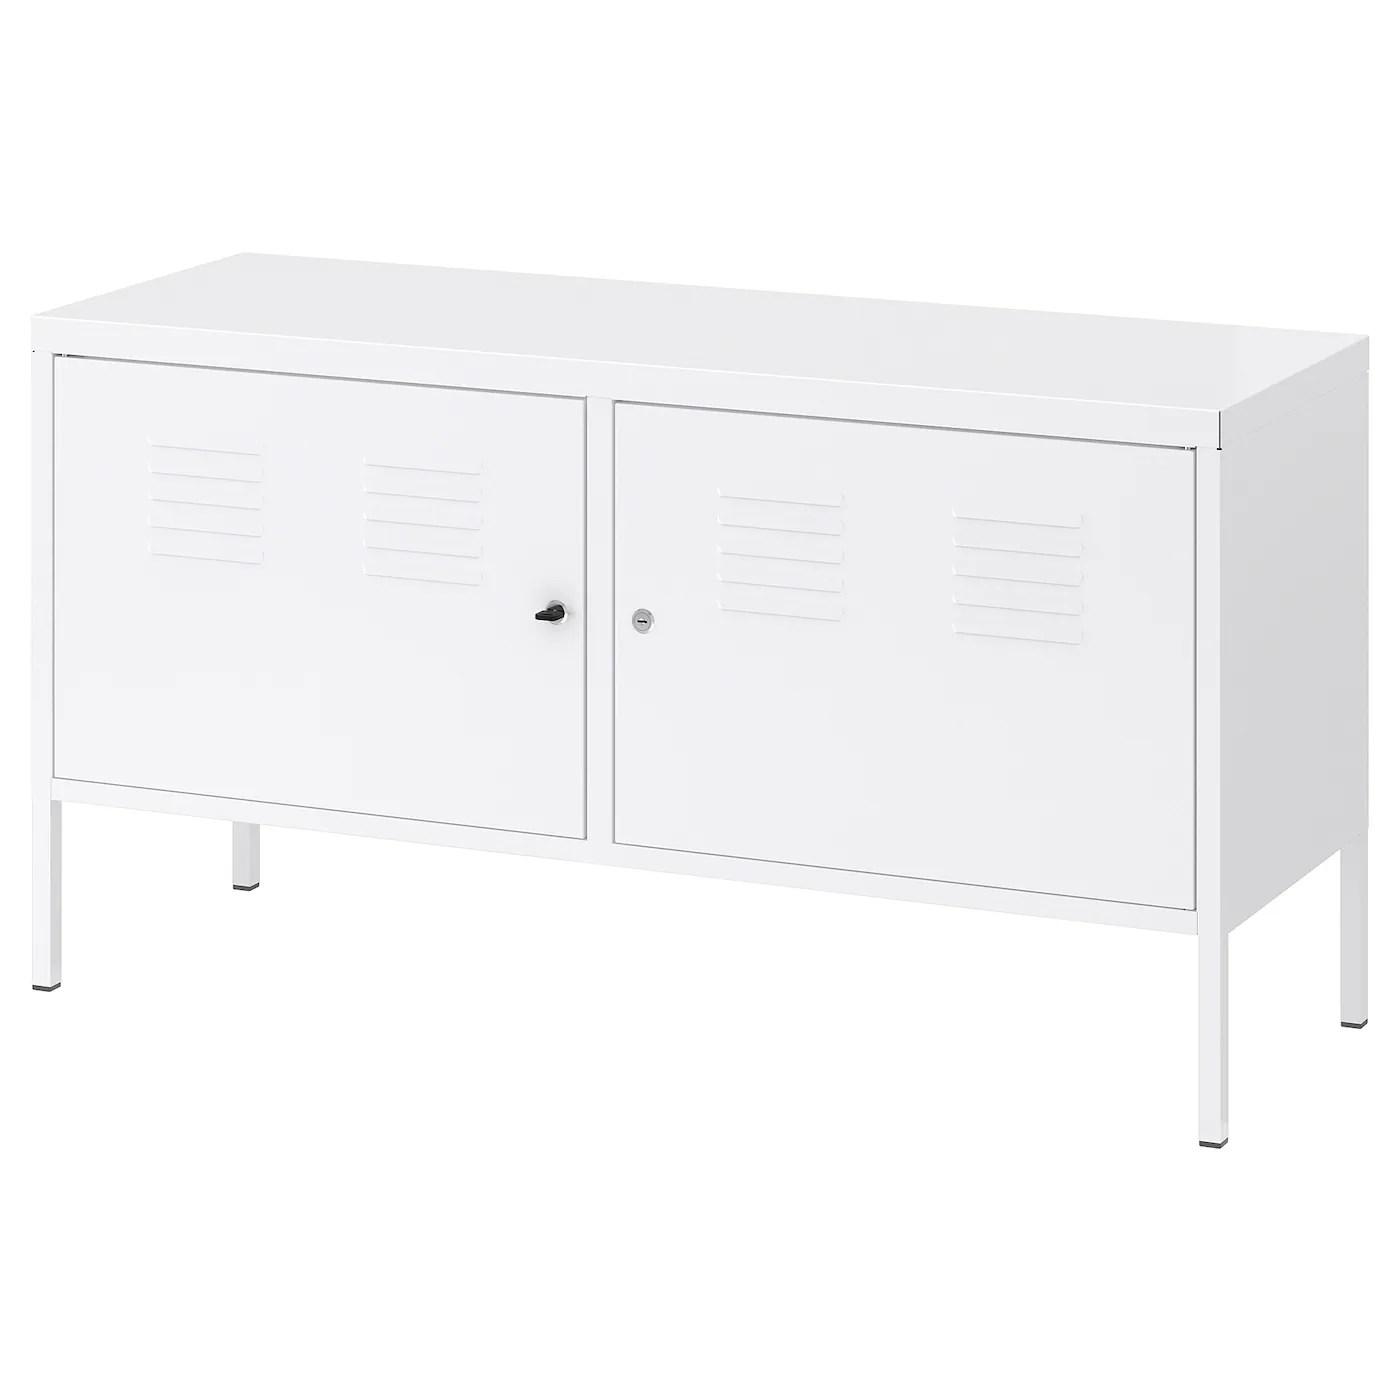 Ikea Ps Armoire Metallique Blanc 119x63 Cm Ikea